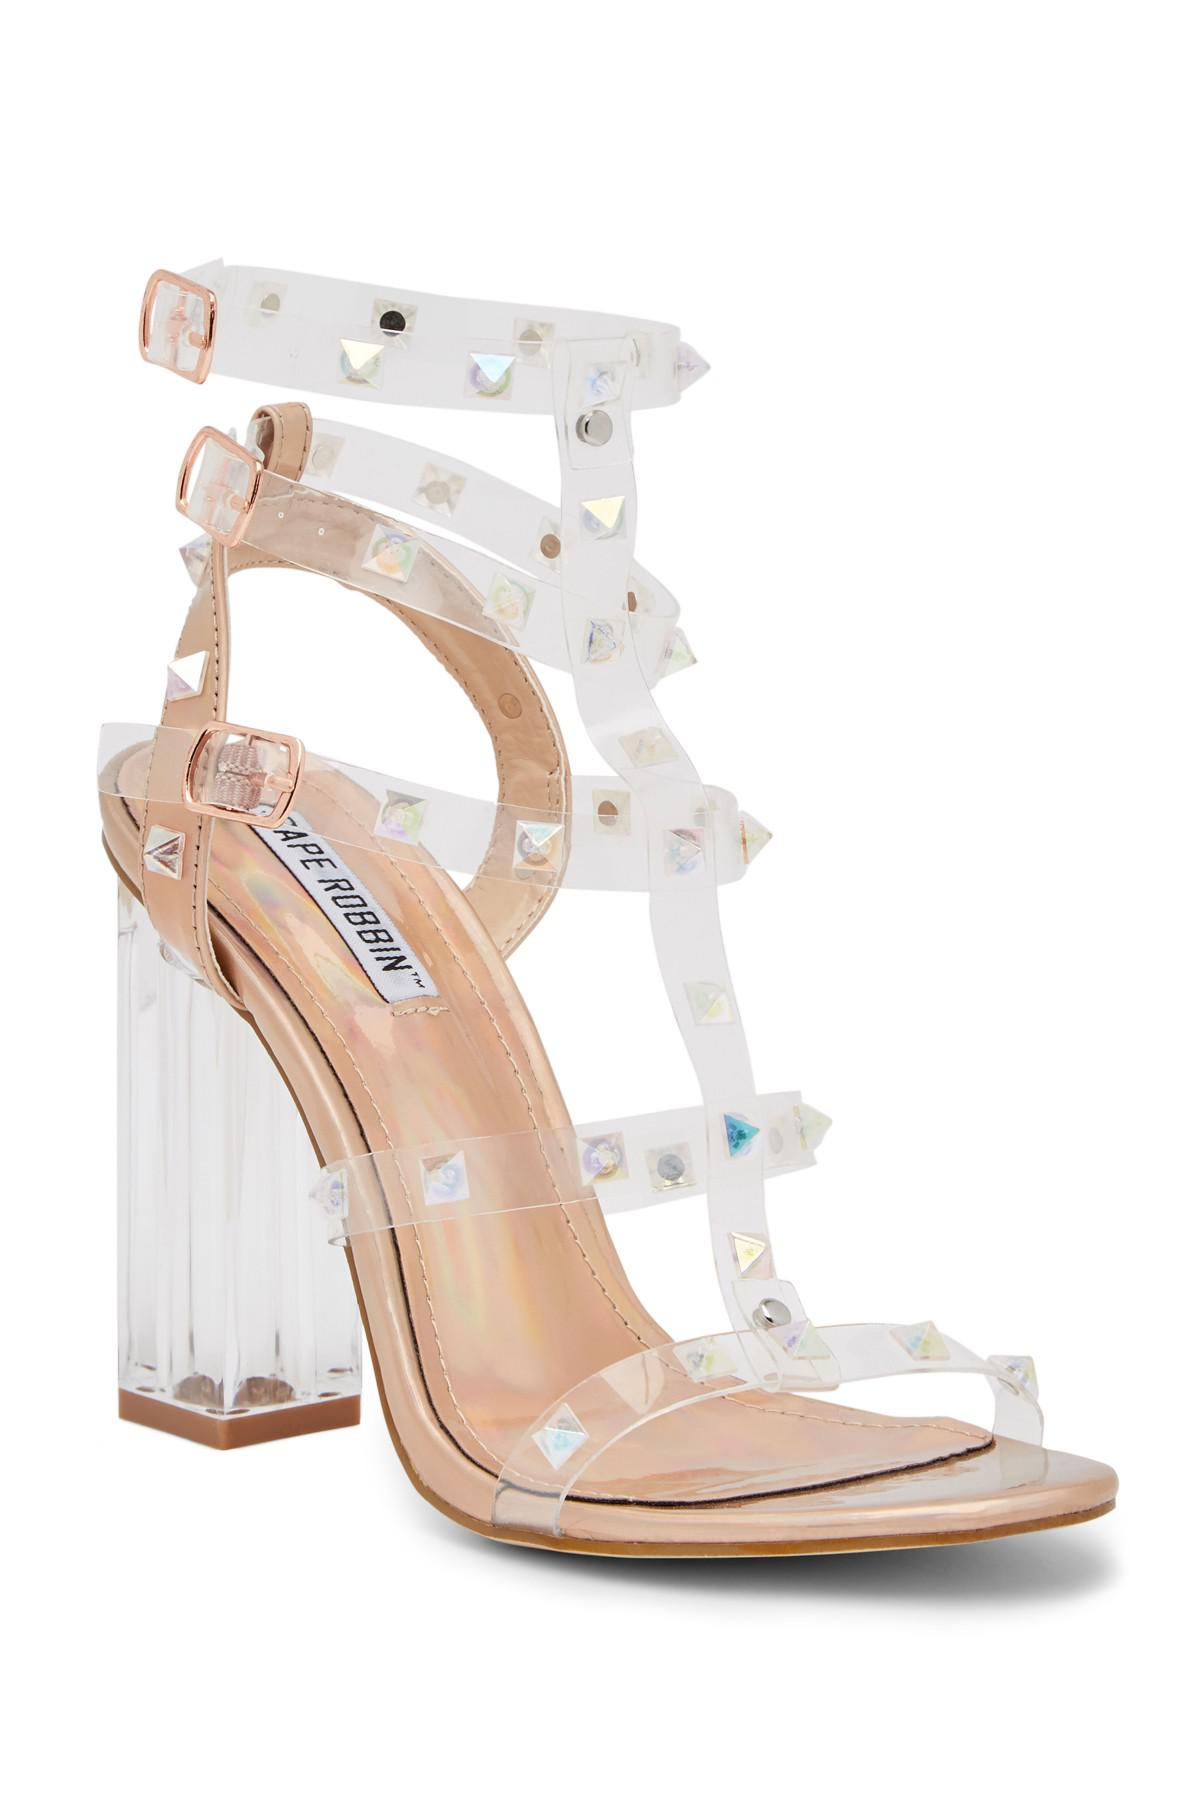 5000568a9b4 Lyst - Cape Robbin Maria Transparent Studded Block Heel